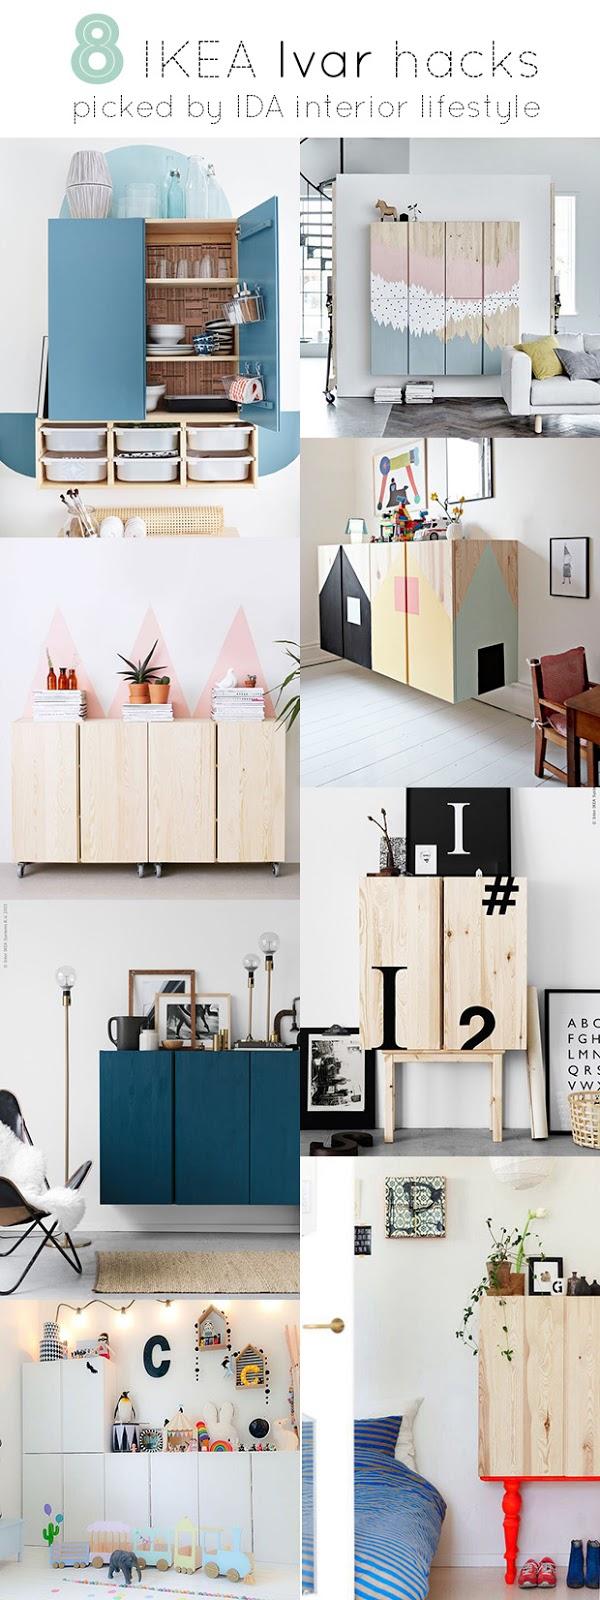 8 Ikea IVAR hacks | IDA Interior LifeStyle | Bloglovin\'